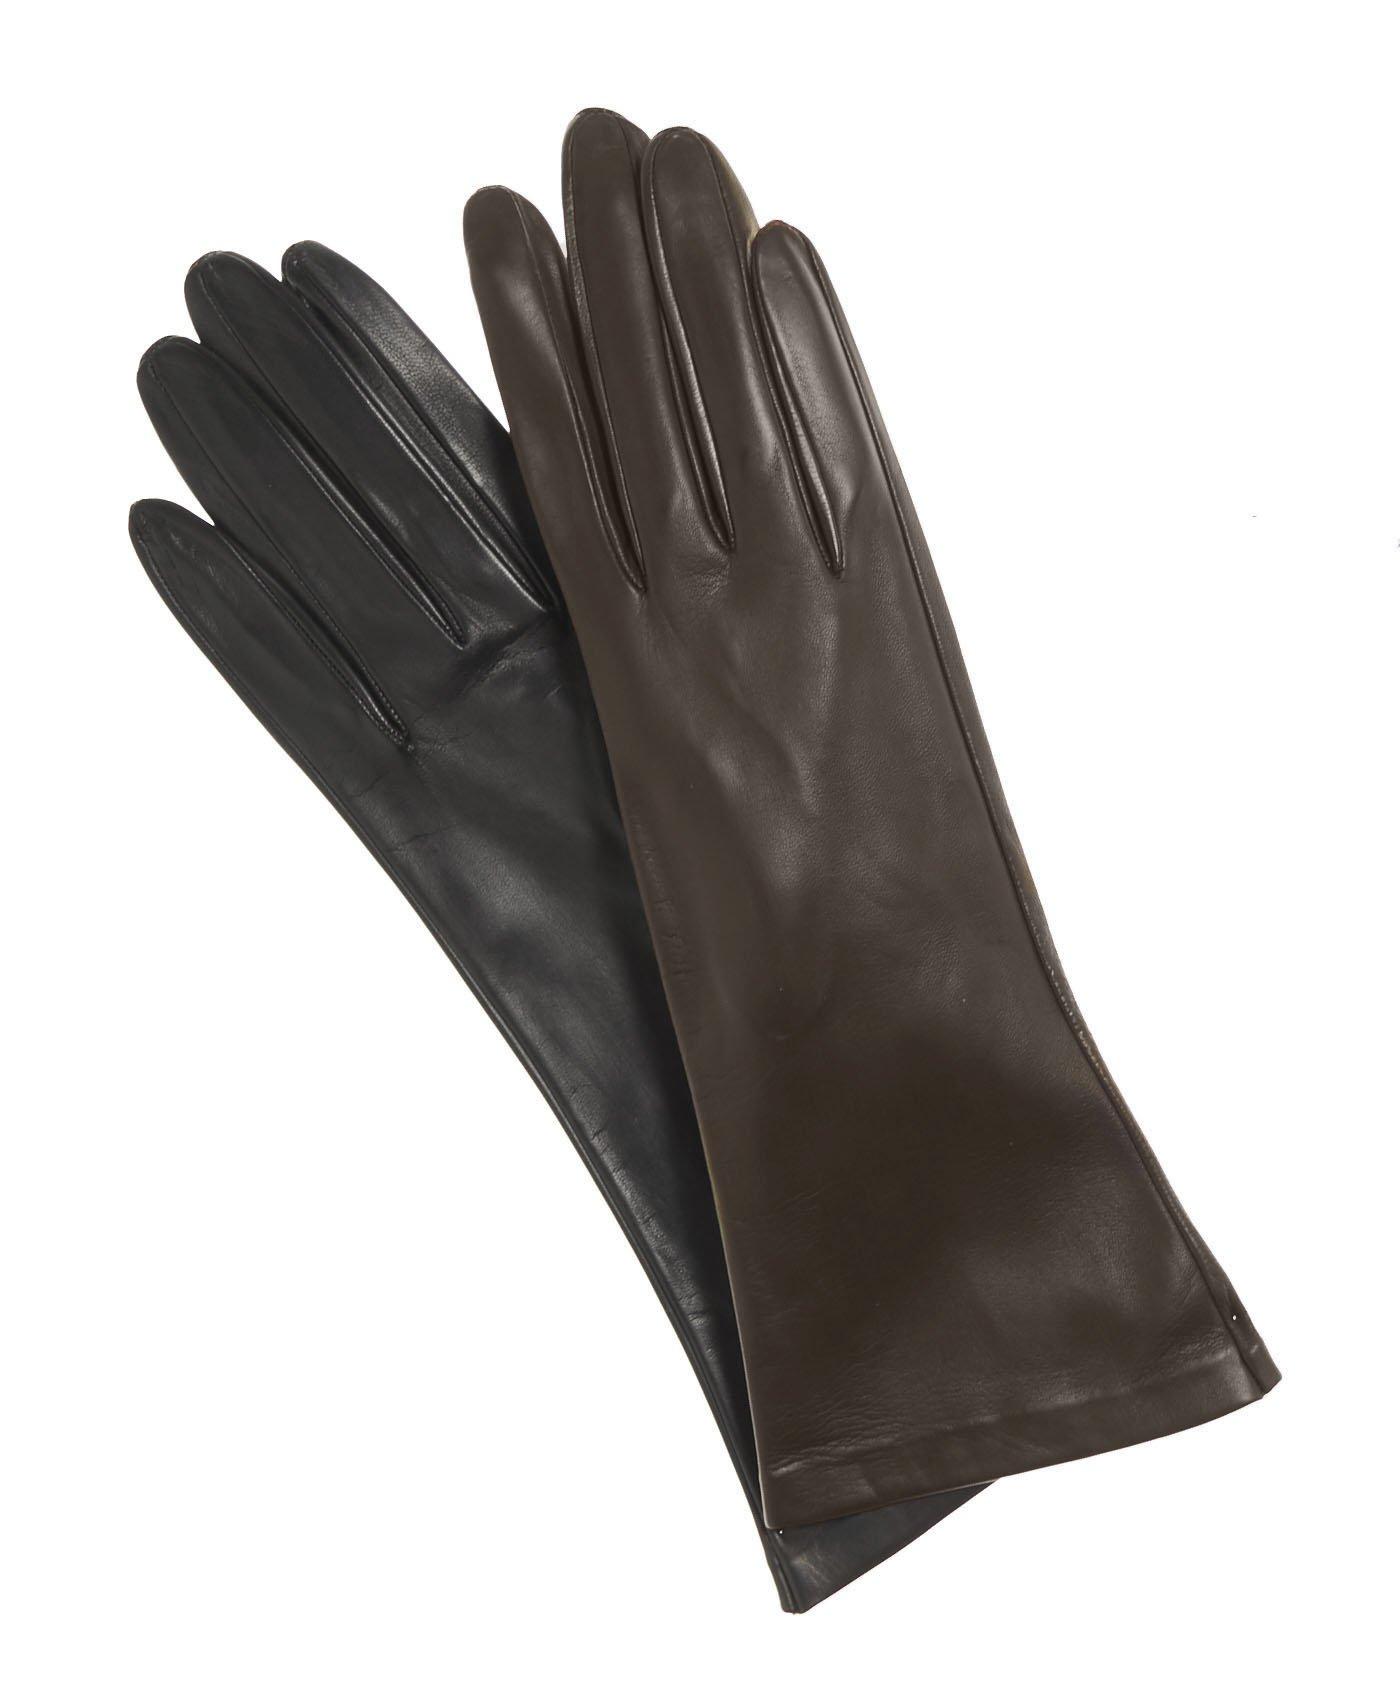 Fratelli Orsini Women's Italian''4 Button Length'' Unlined Leather Gloves Size 7 Color Black